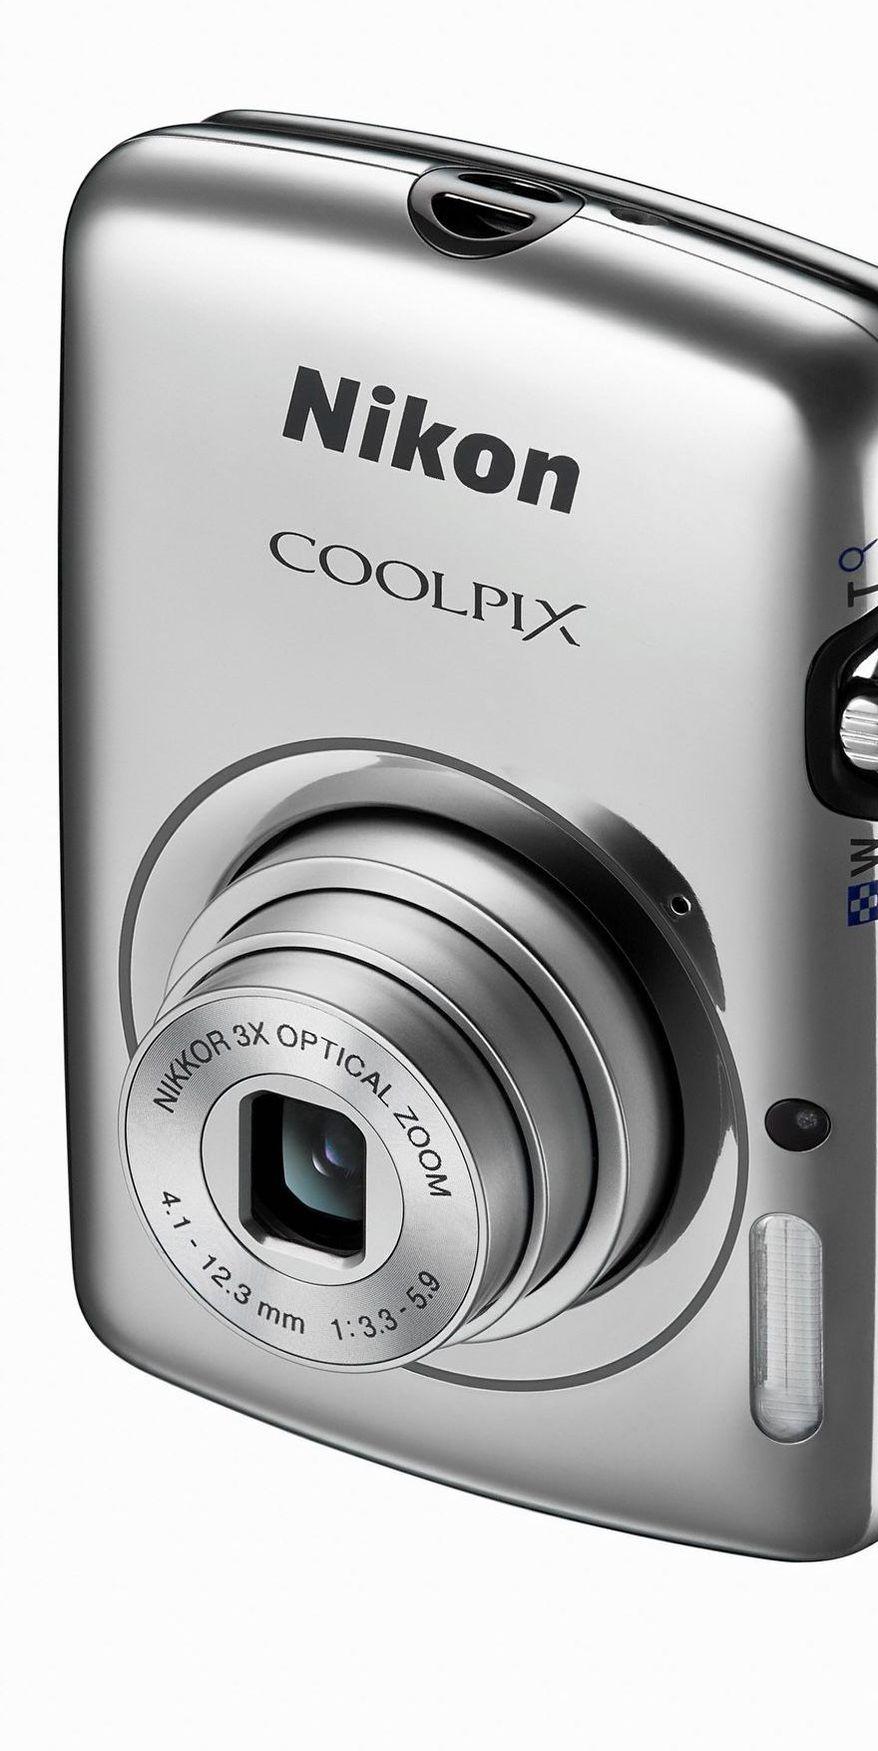 Nikon COOLPIX S01 (nikonusa.com)